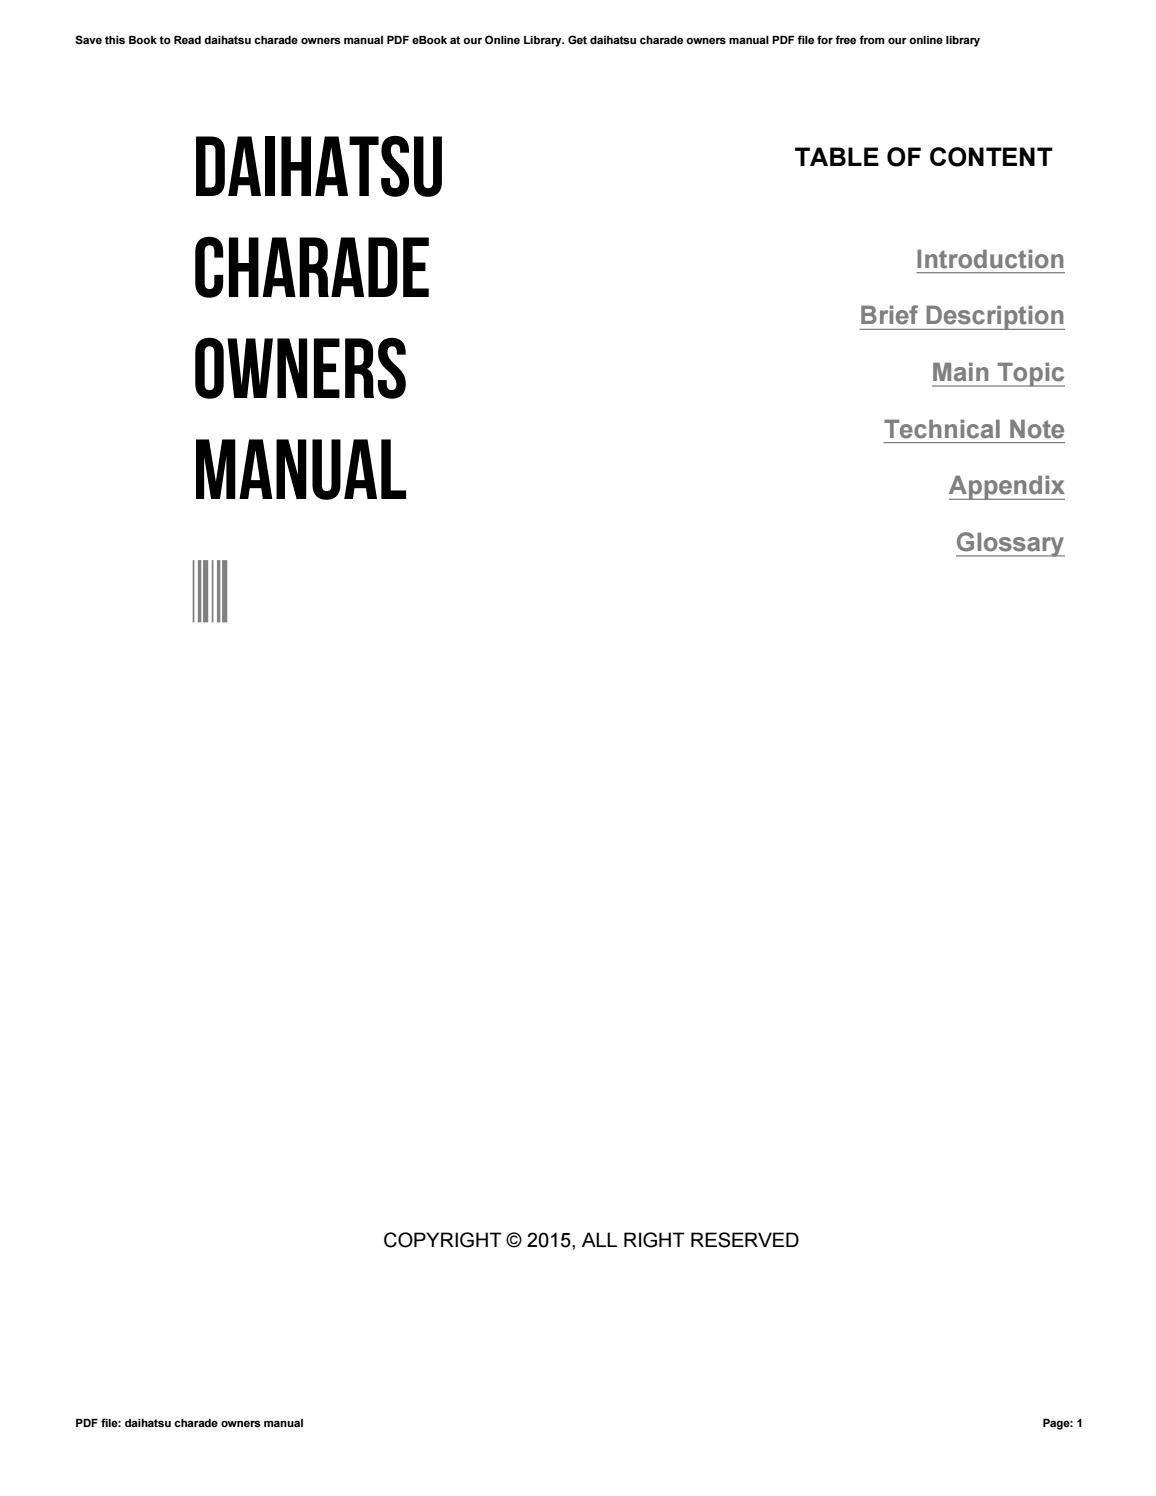 ... Array - yamaha vx11 repair manual ebook rh yamaha vx11 repair manual  ebook pureroseoil us